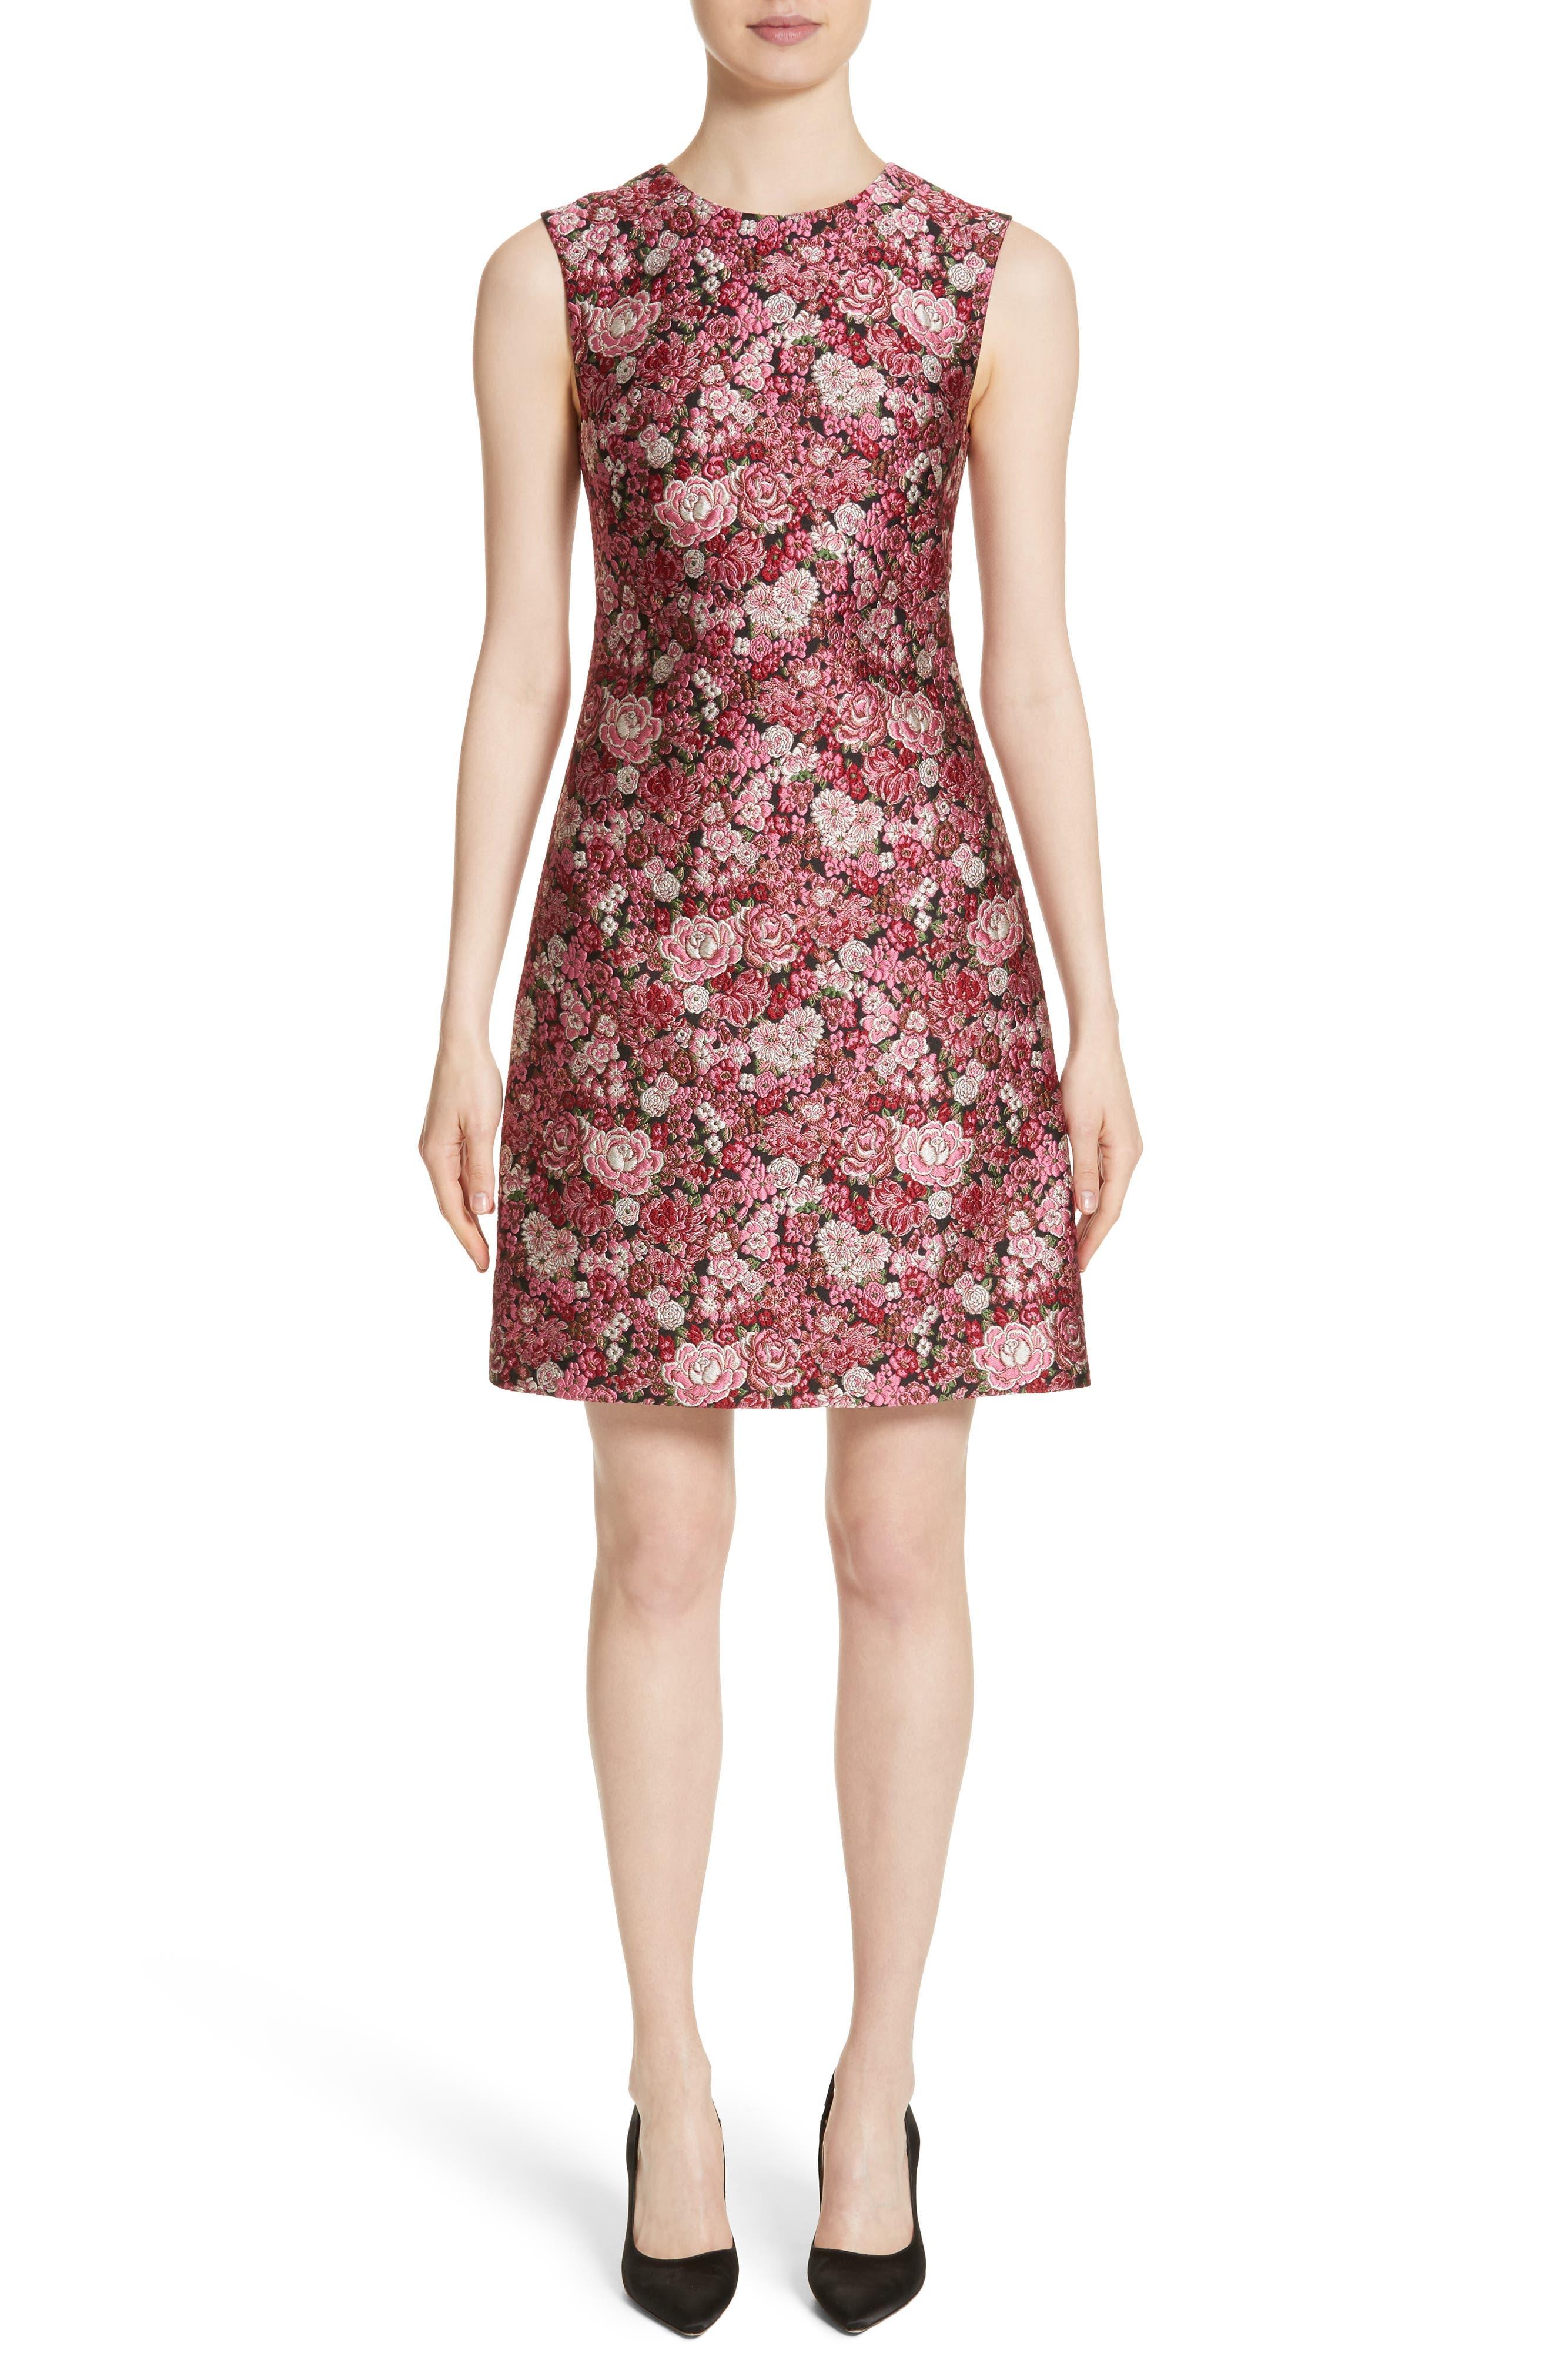 Adam Lippes Floral Brocade Dress